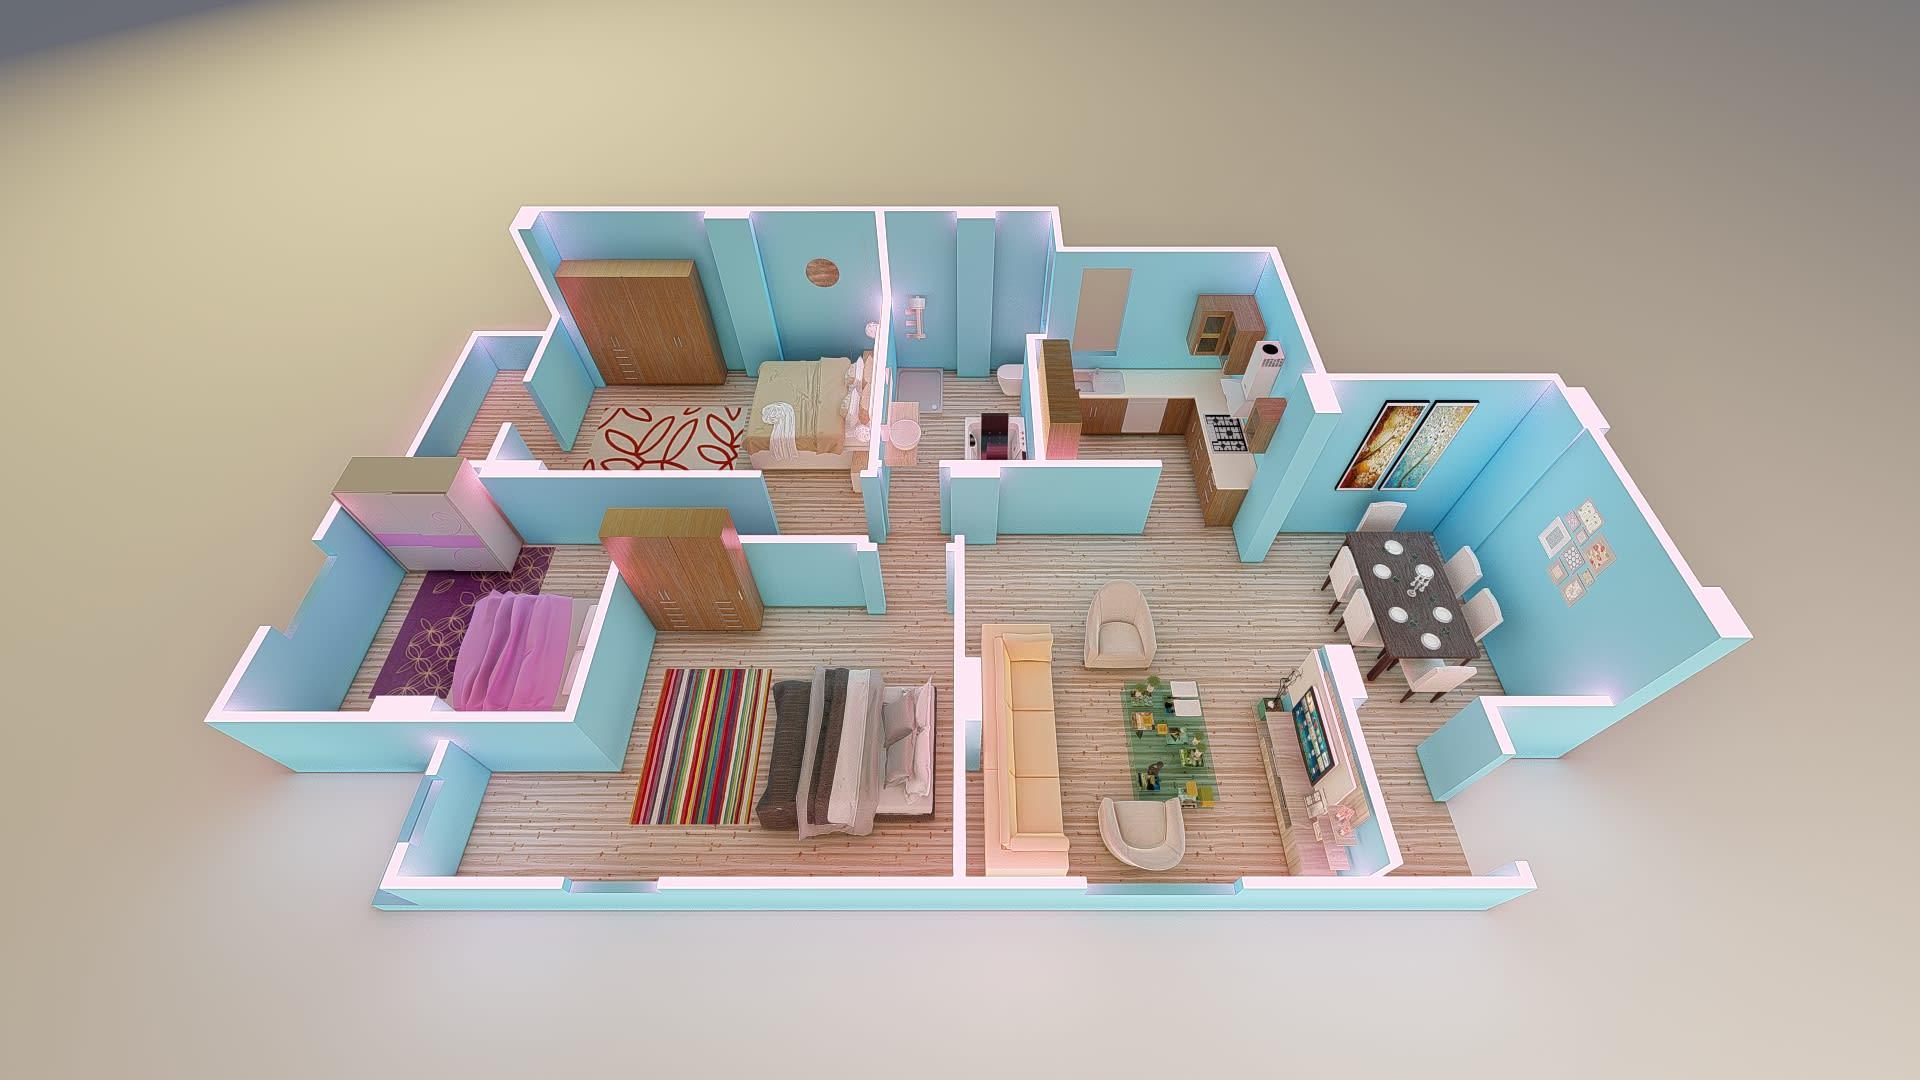 Convert Floor Plan To 3d Interior Design Rendering 3d Walkthrough Movie By Academydesign Fiverr